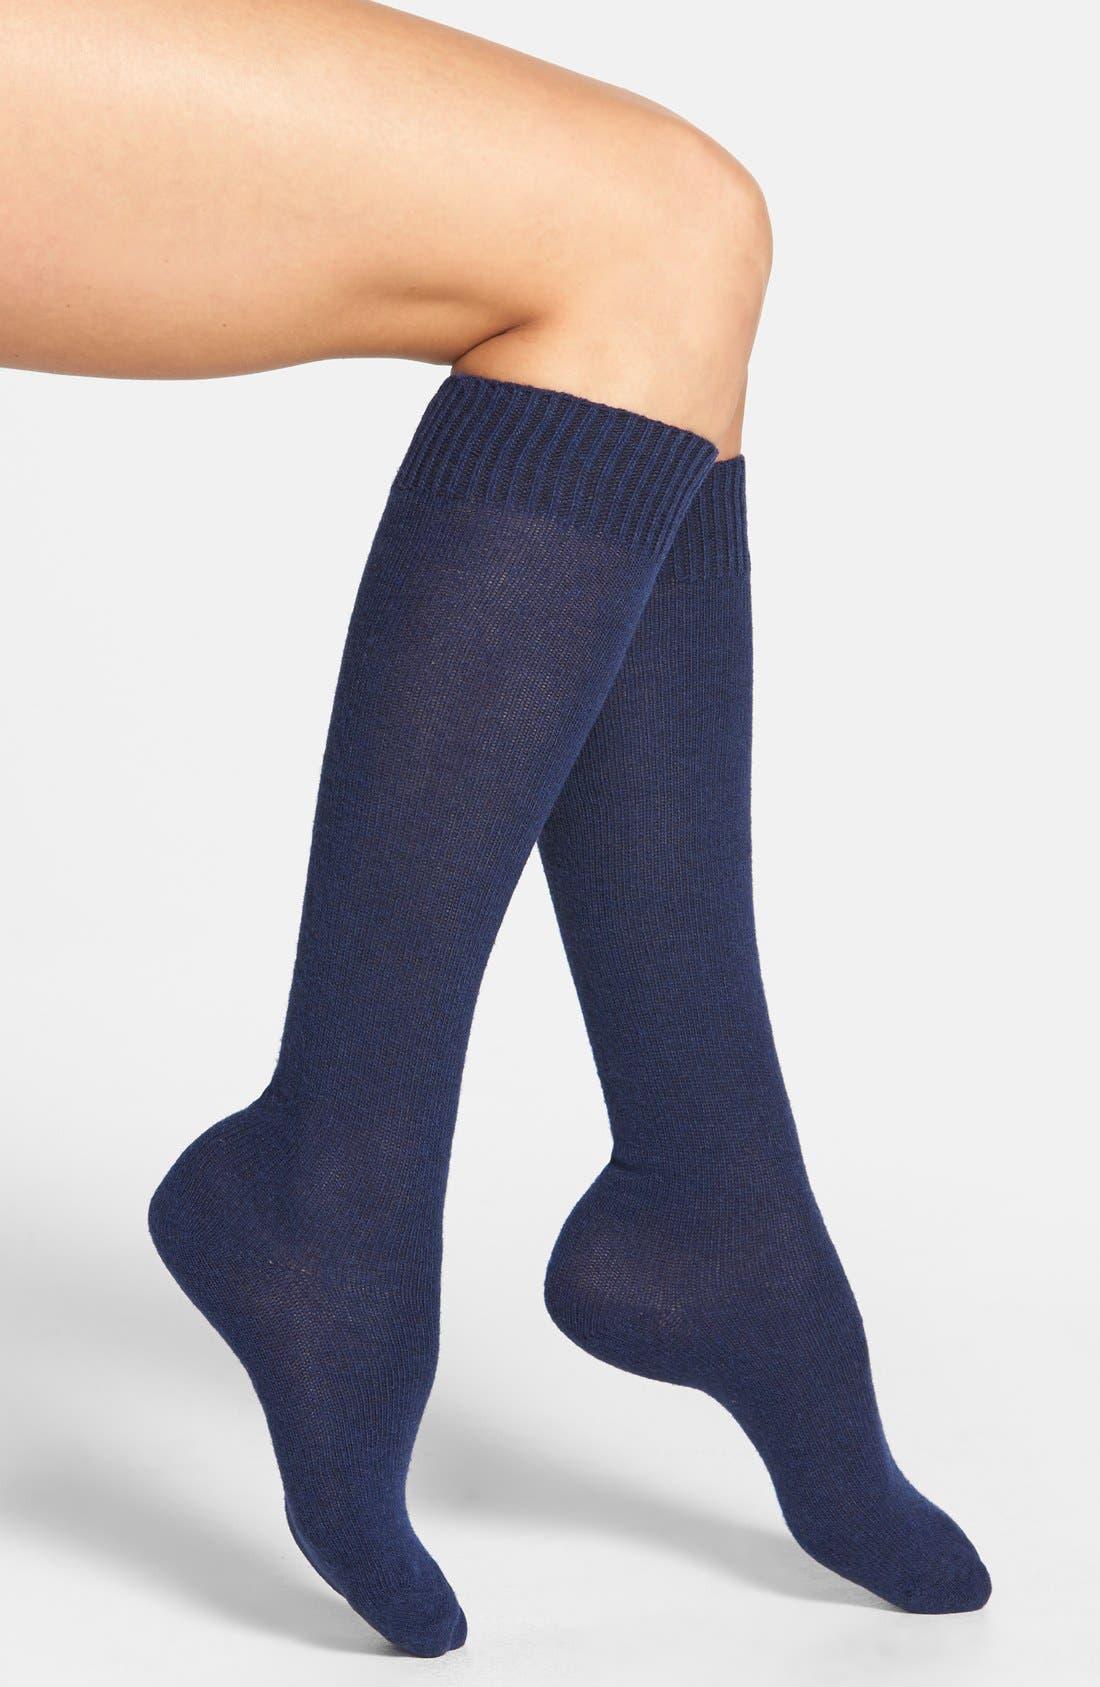 Knee High Socks,                         Main,                         color, Navy